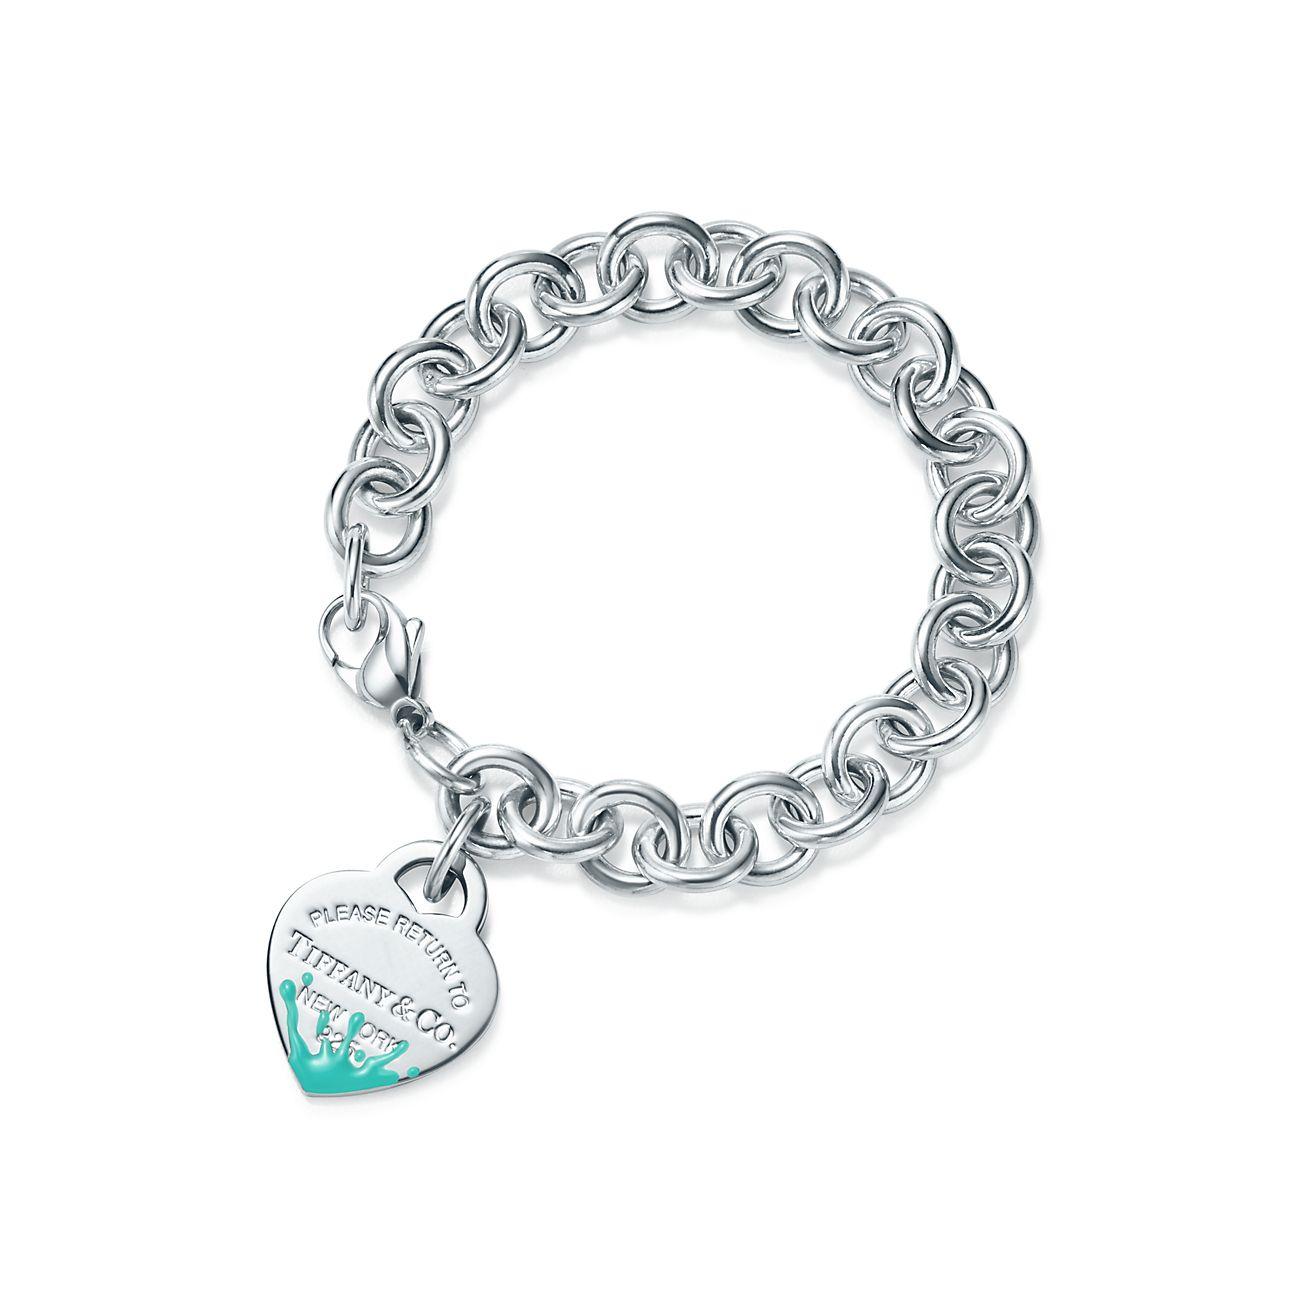 Tiffany Heart Bracelet >> Return To Tiffany Color Splash Heart Tag Bracelet In Sterling